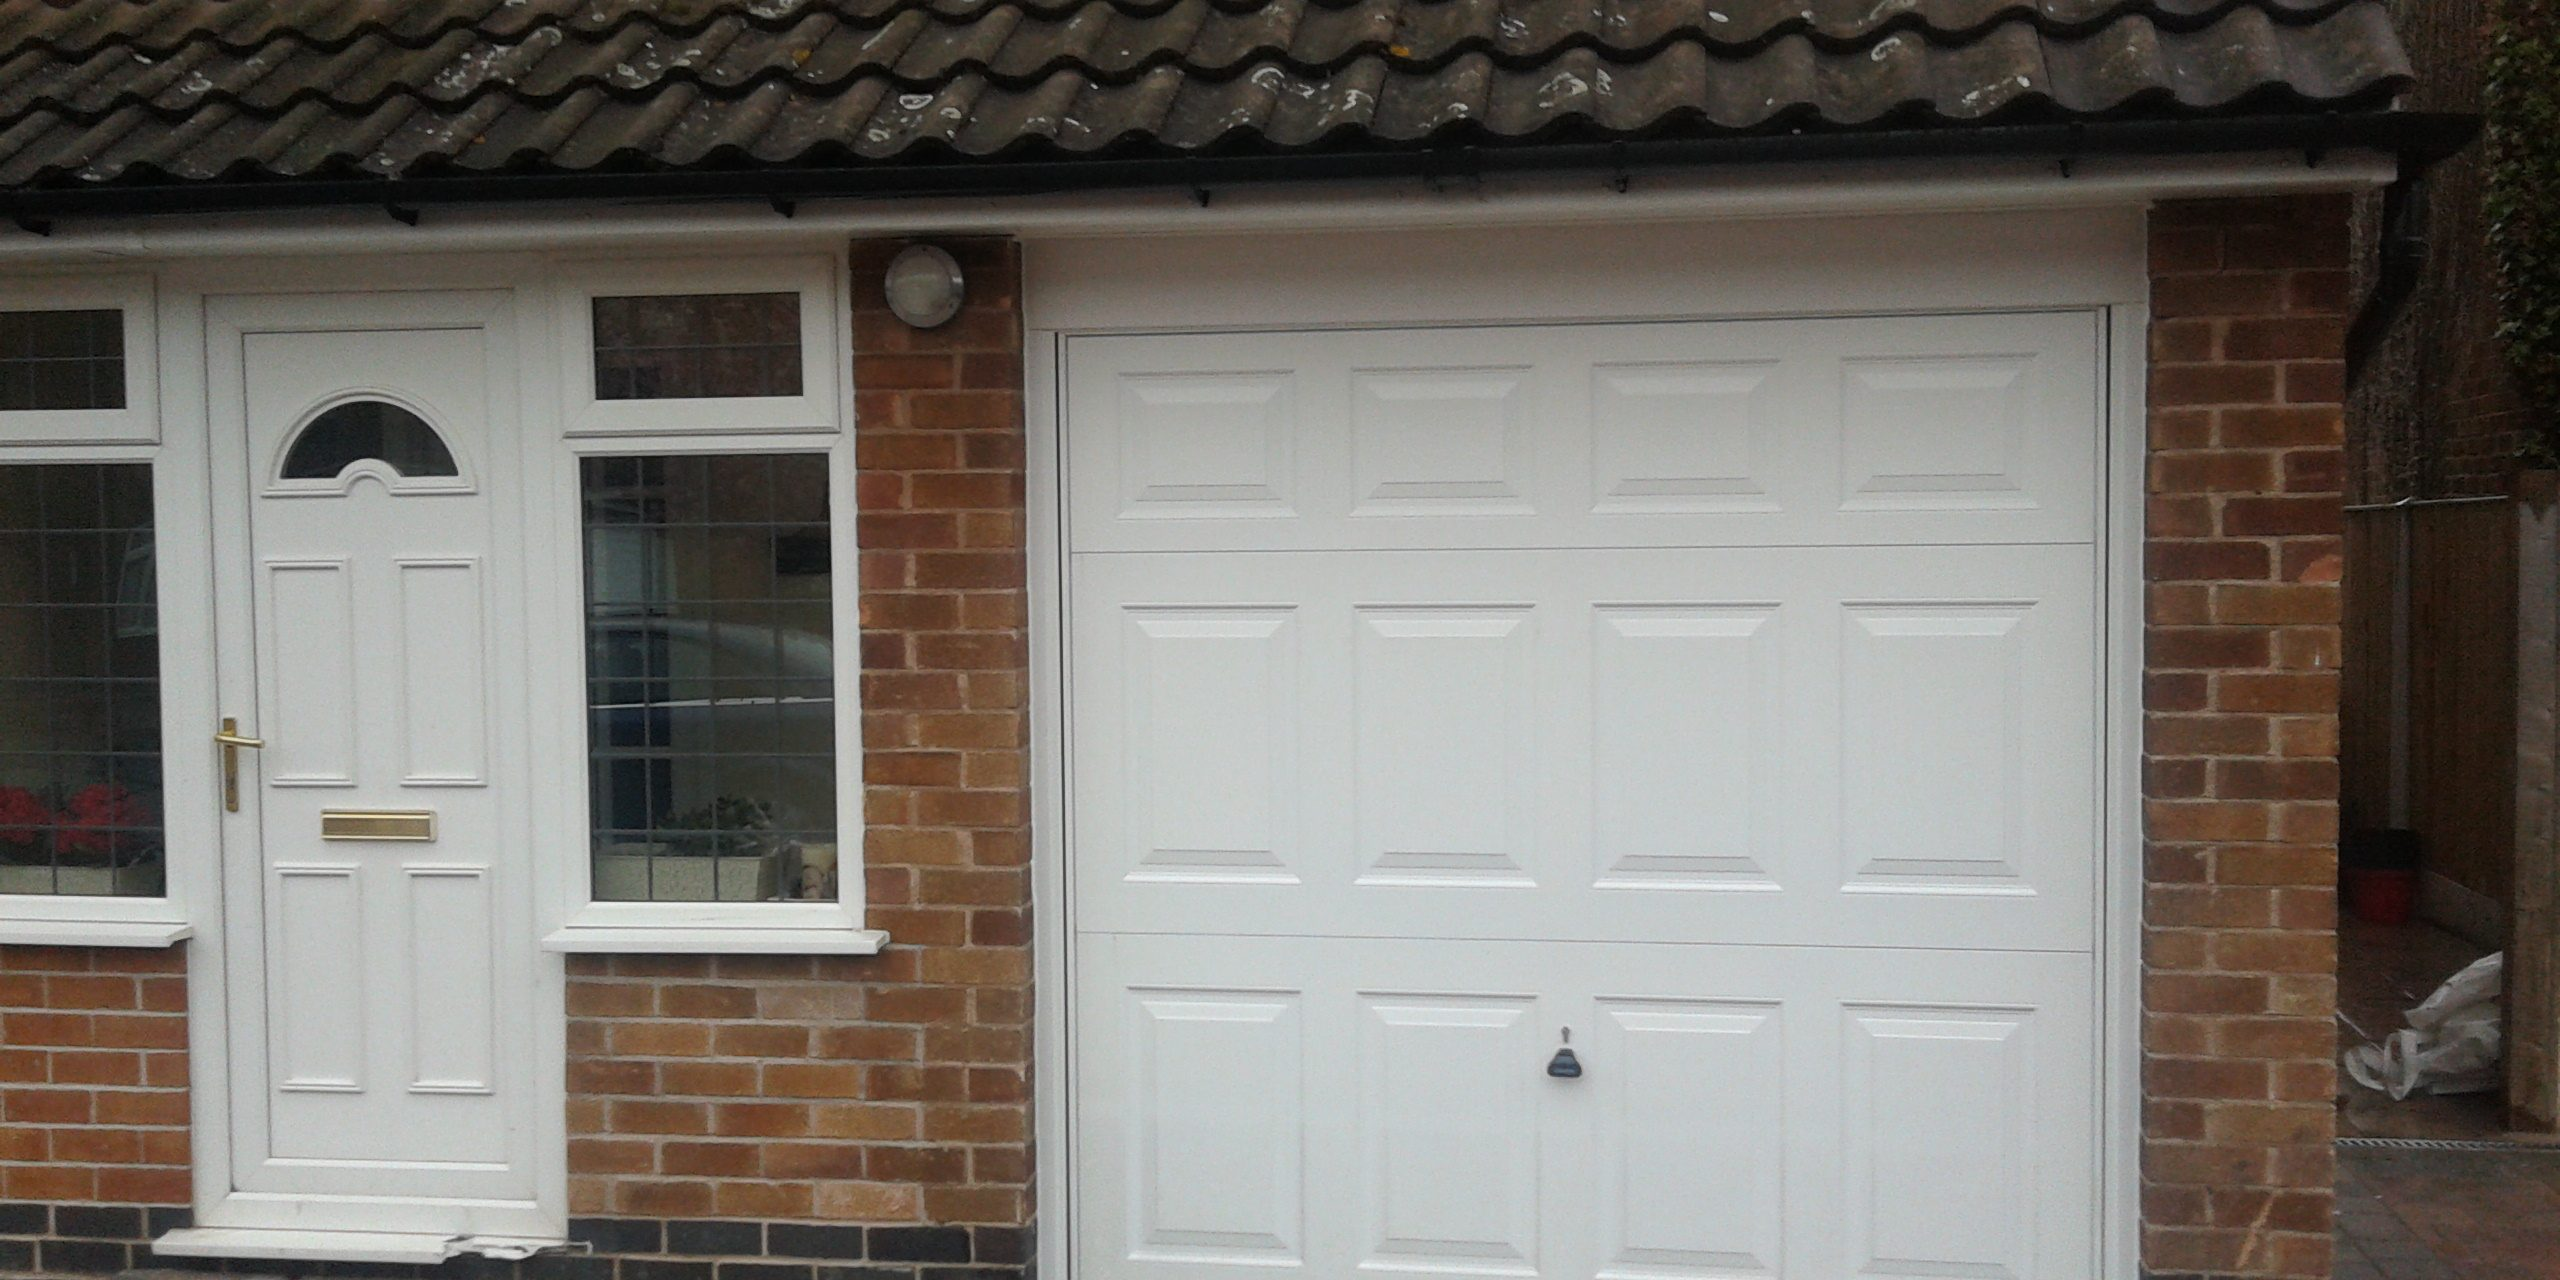 New Garage Door Nottingham & White Canopy Garage Door in Nottingham u2013 Garage Door Company Grantham